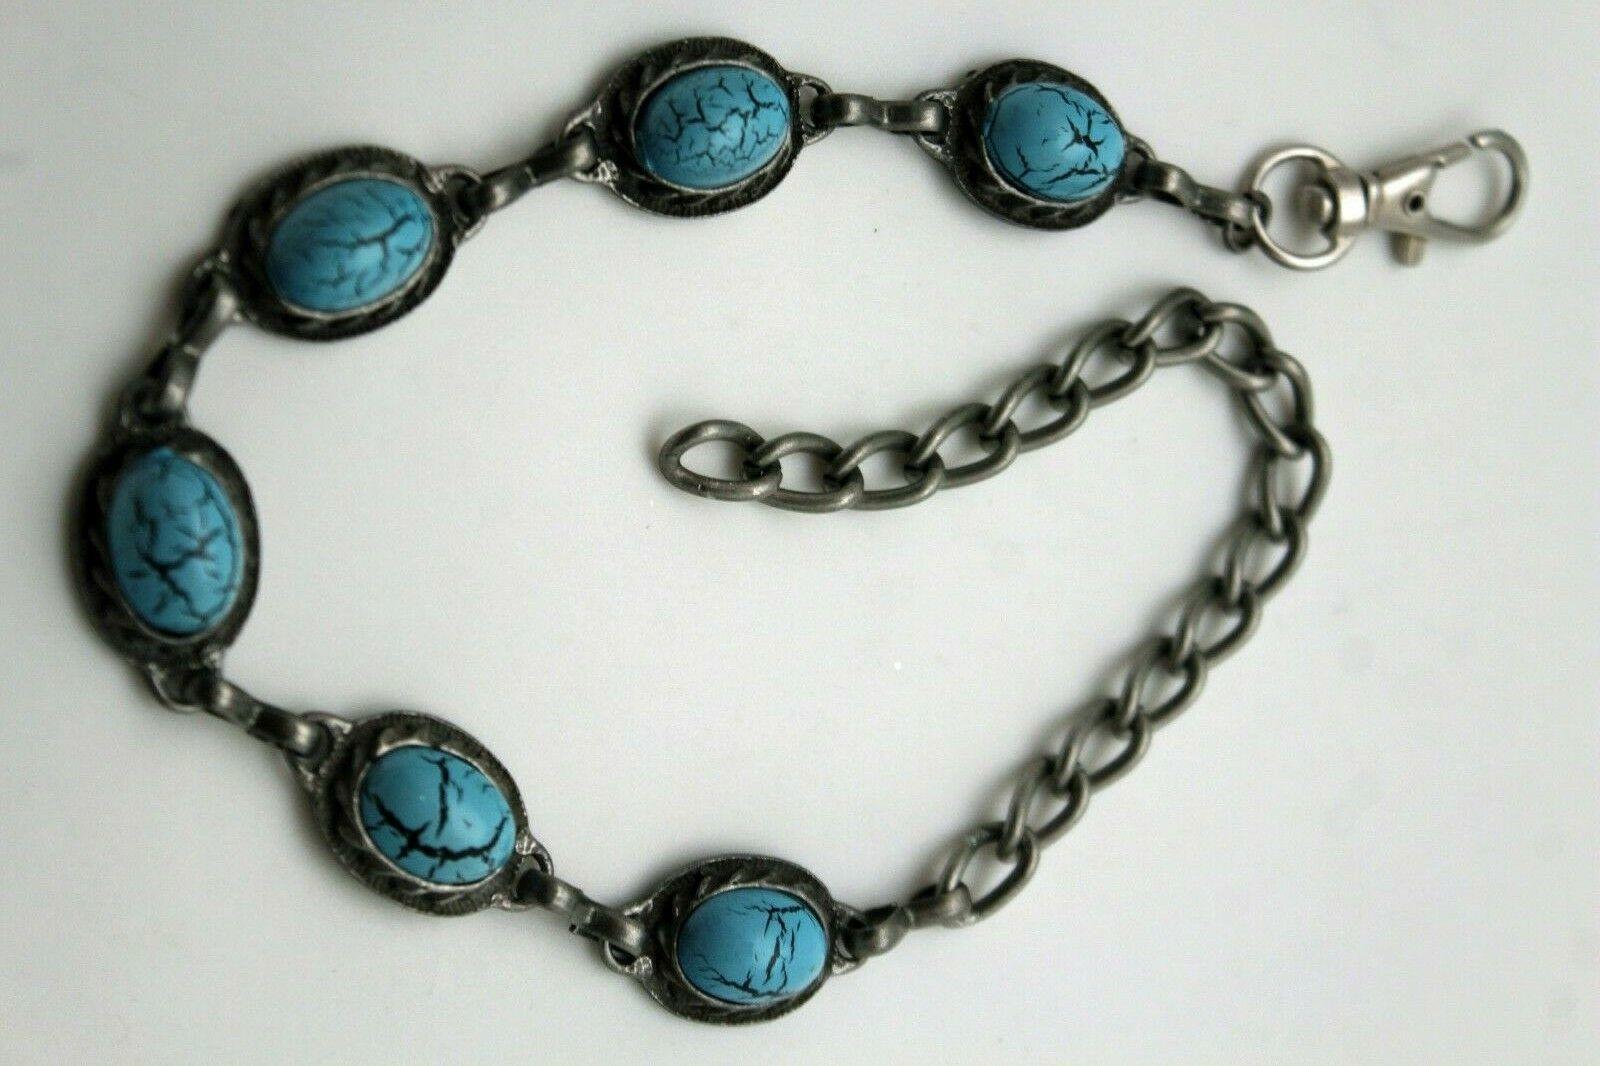 Women Jewelry Ethnic Boot Bracelet Antique Silver Metal Chain Blue Charm Biker